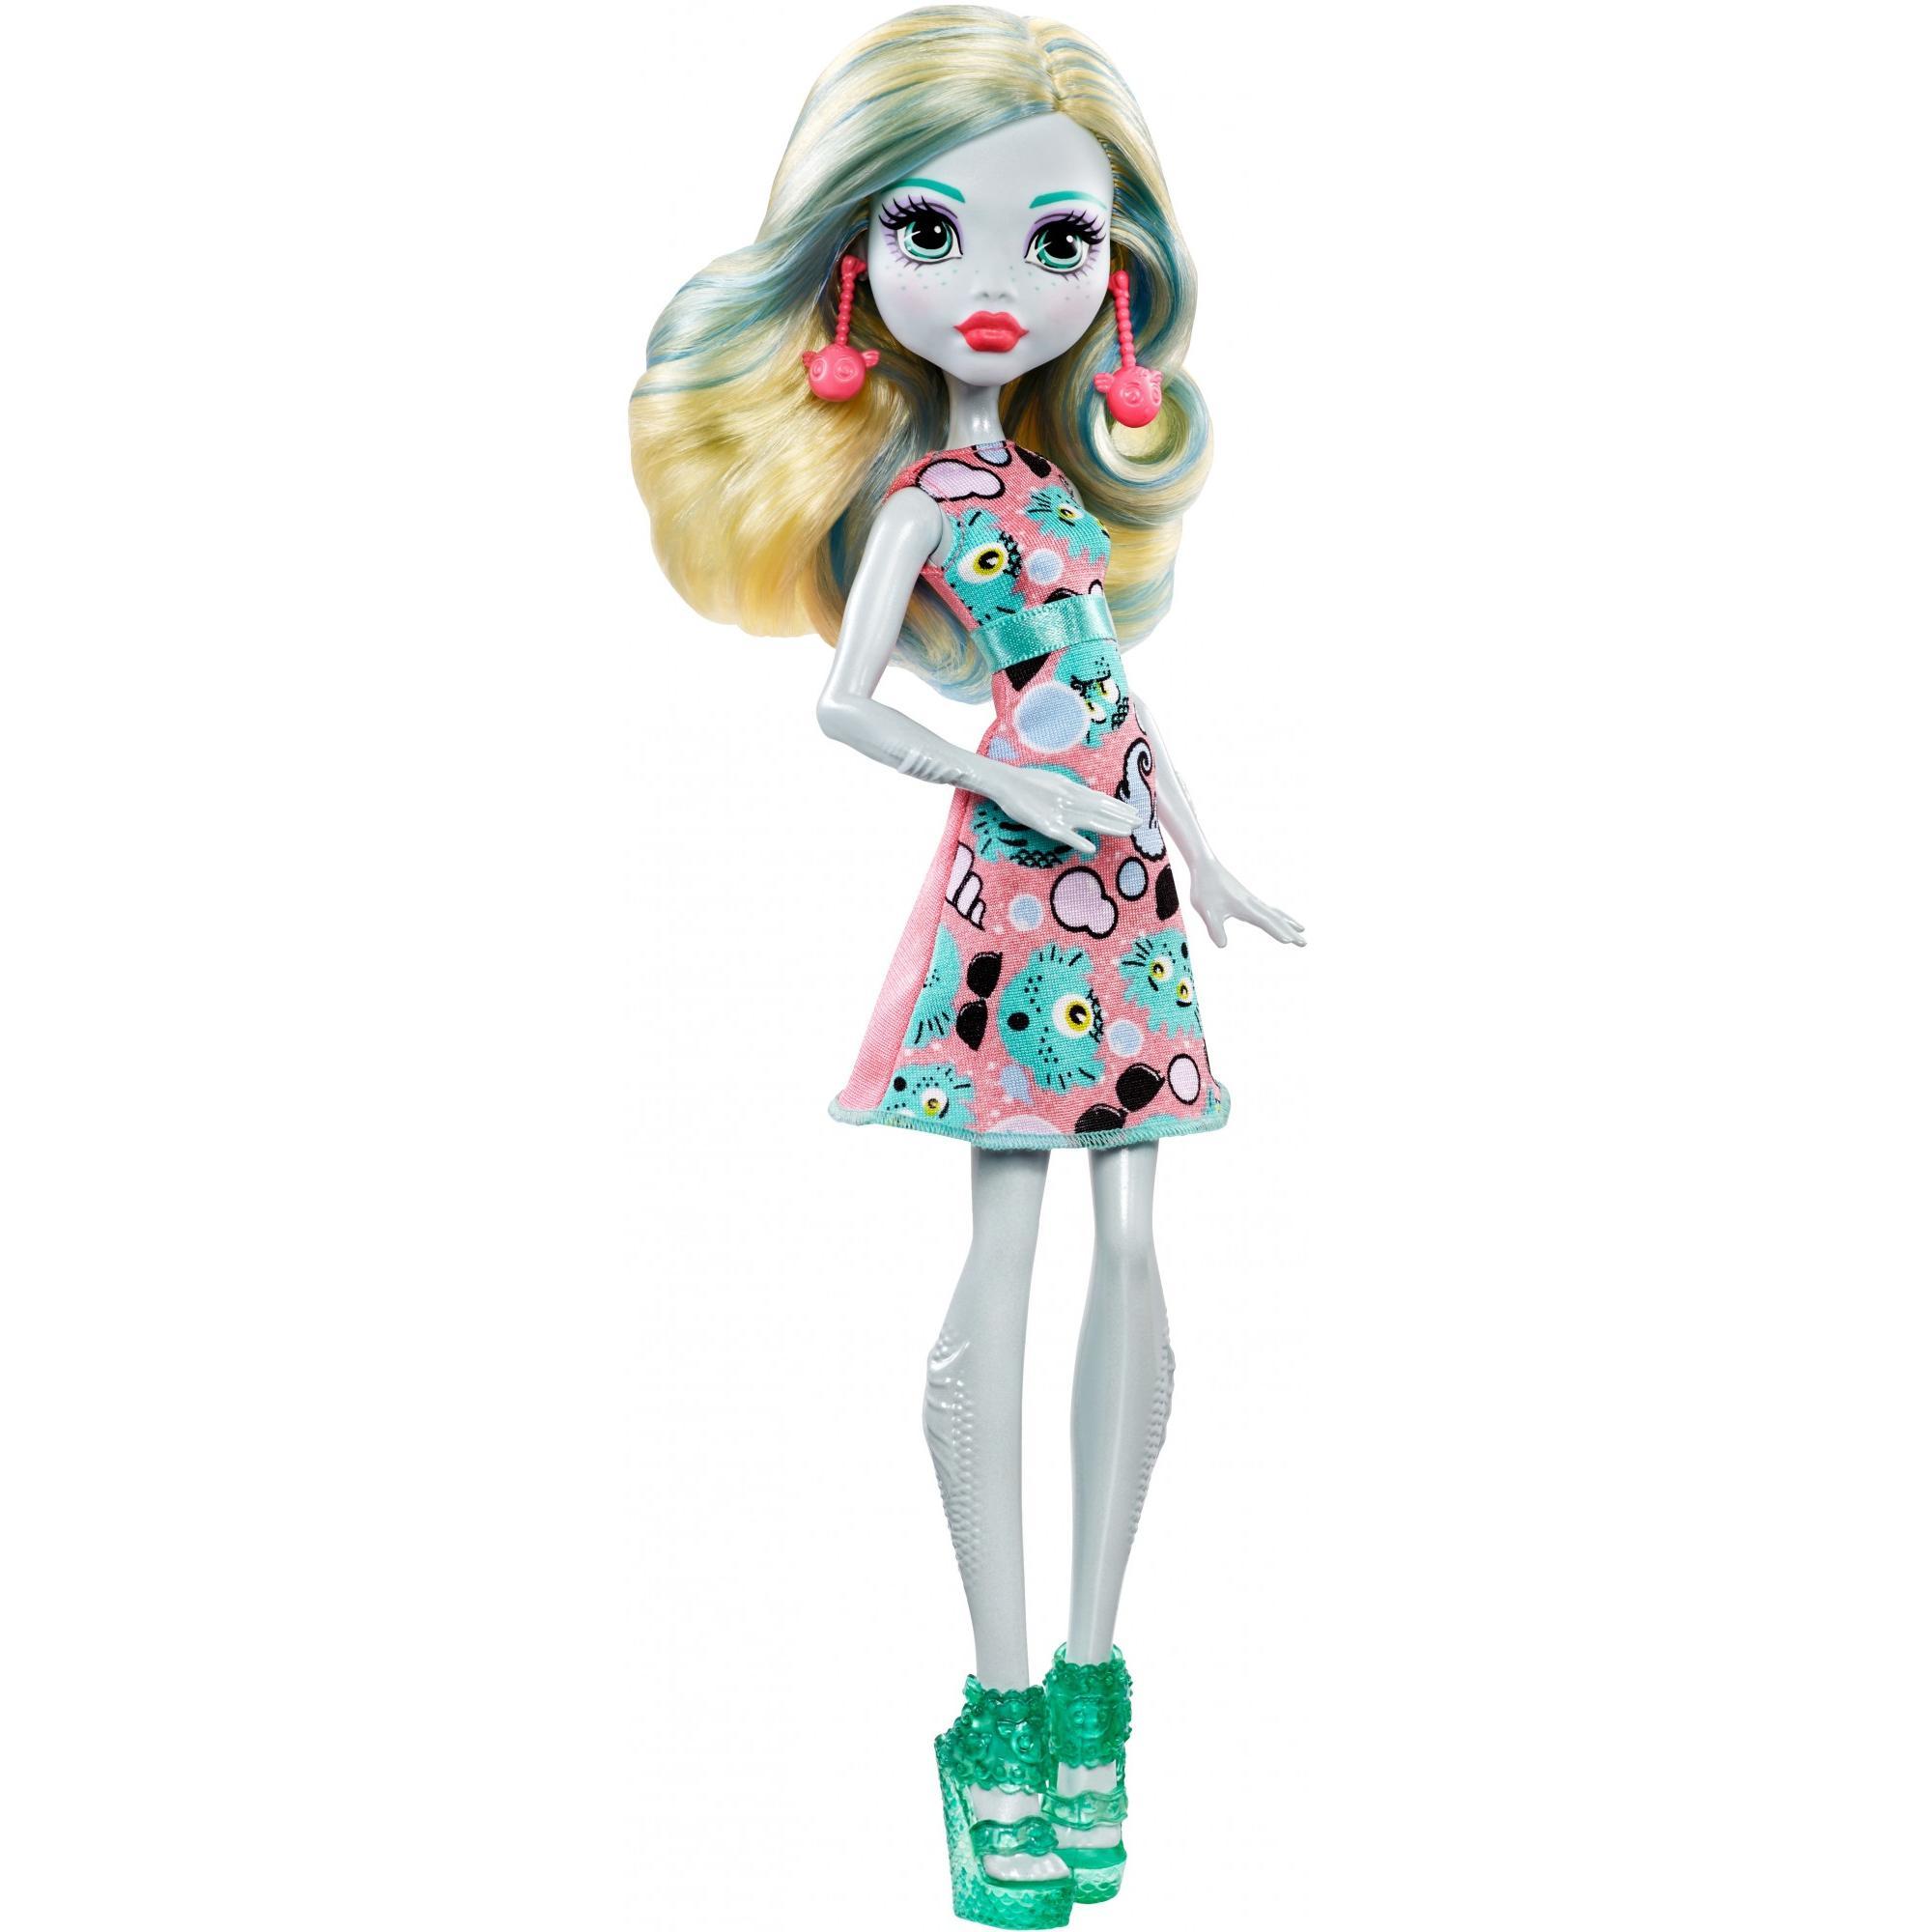 Monster High Lagoona Blue Doll by MATTEL INC.